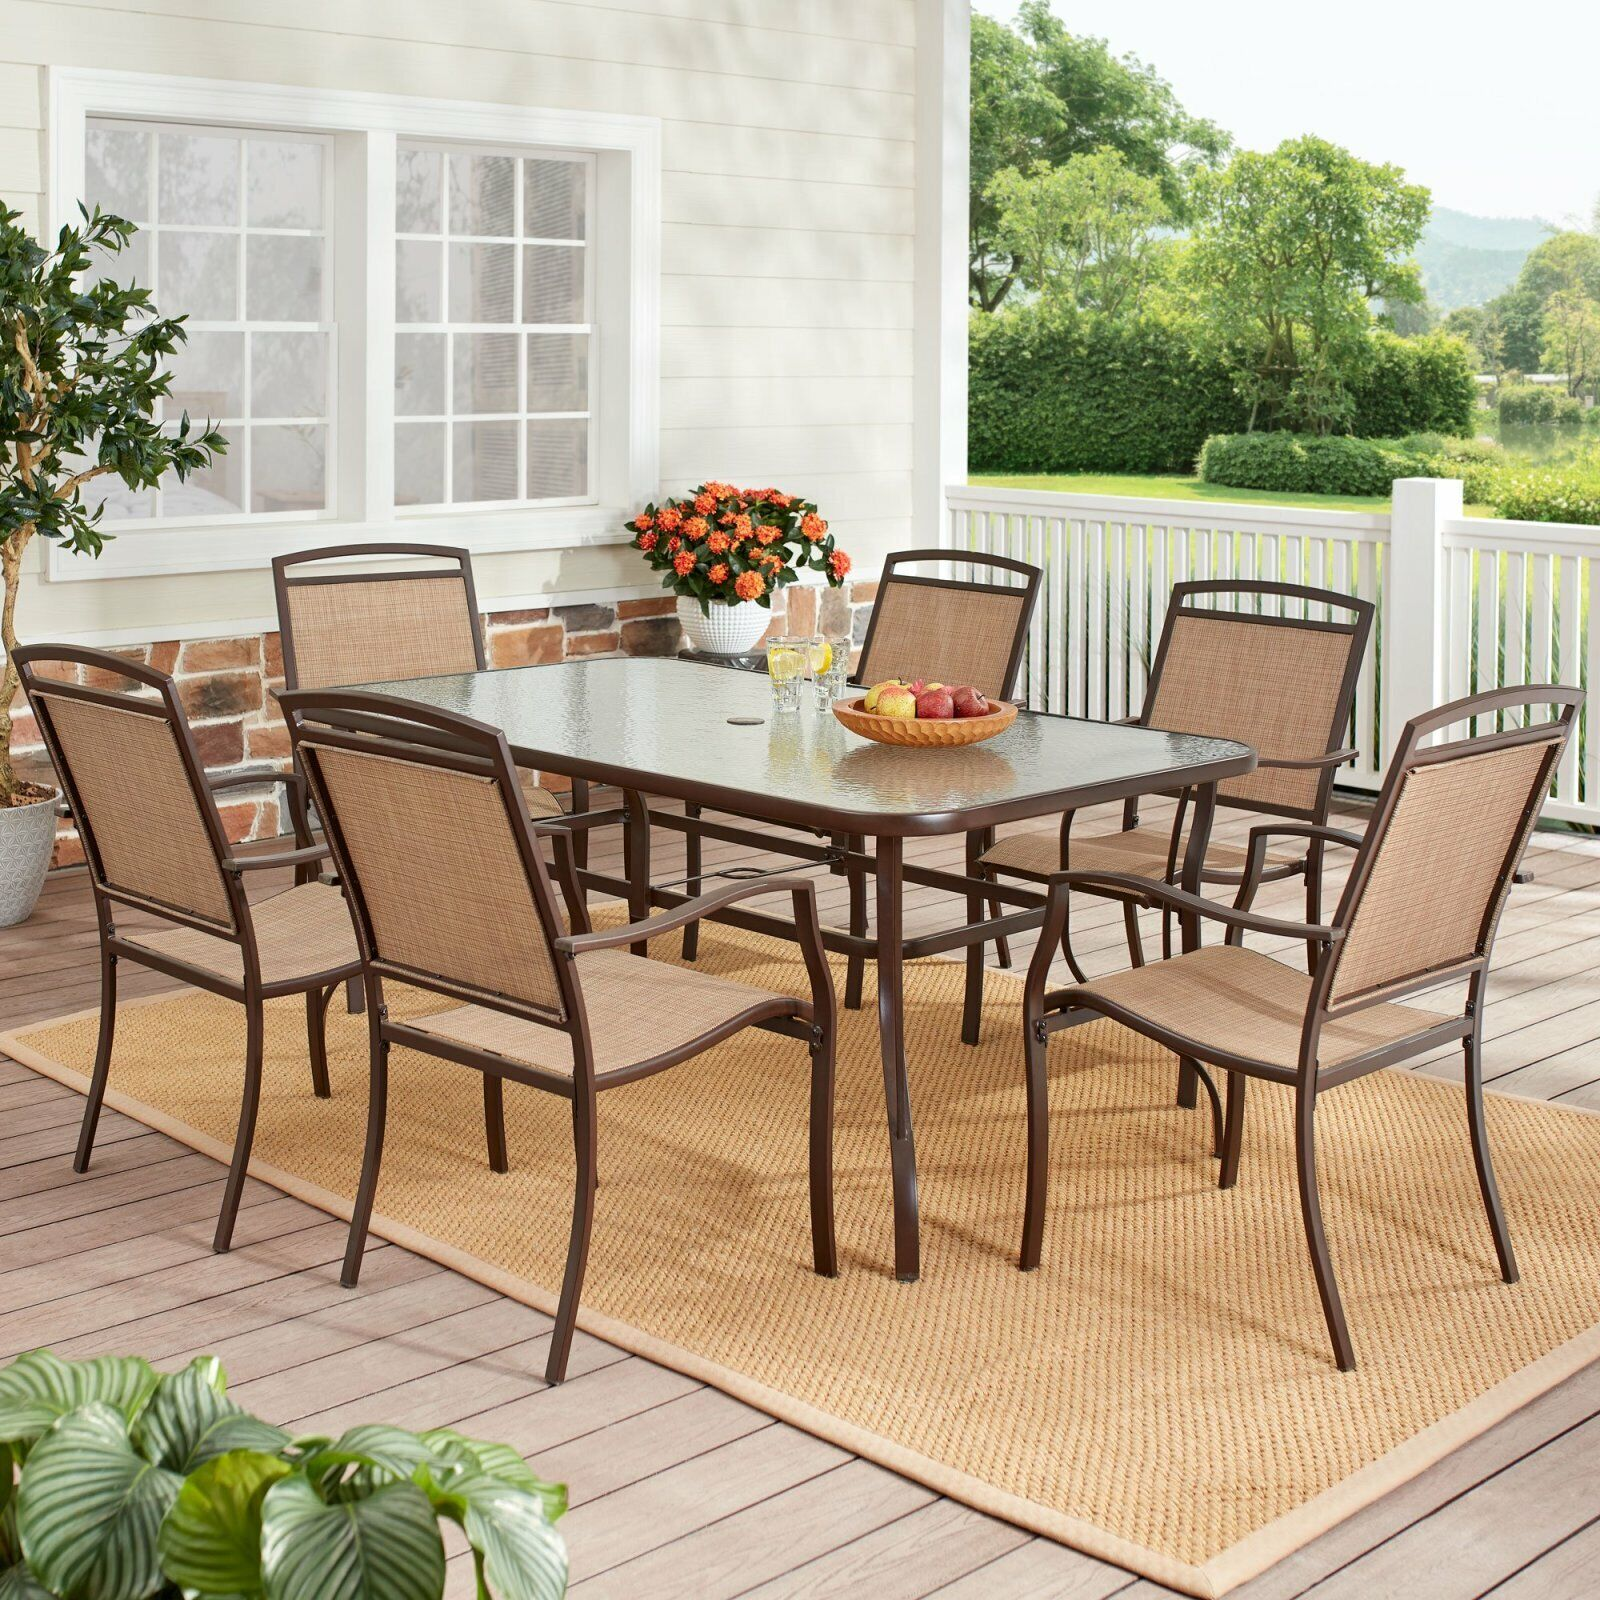 Garden Furniture - 7 Piece Outdoor Patio Dining Set Table Chairs Garden Furniture Yard Lawn Deck